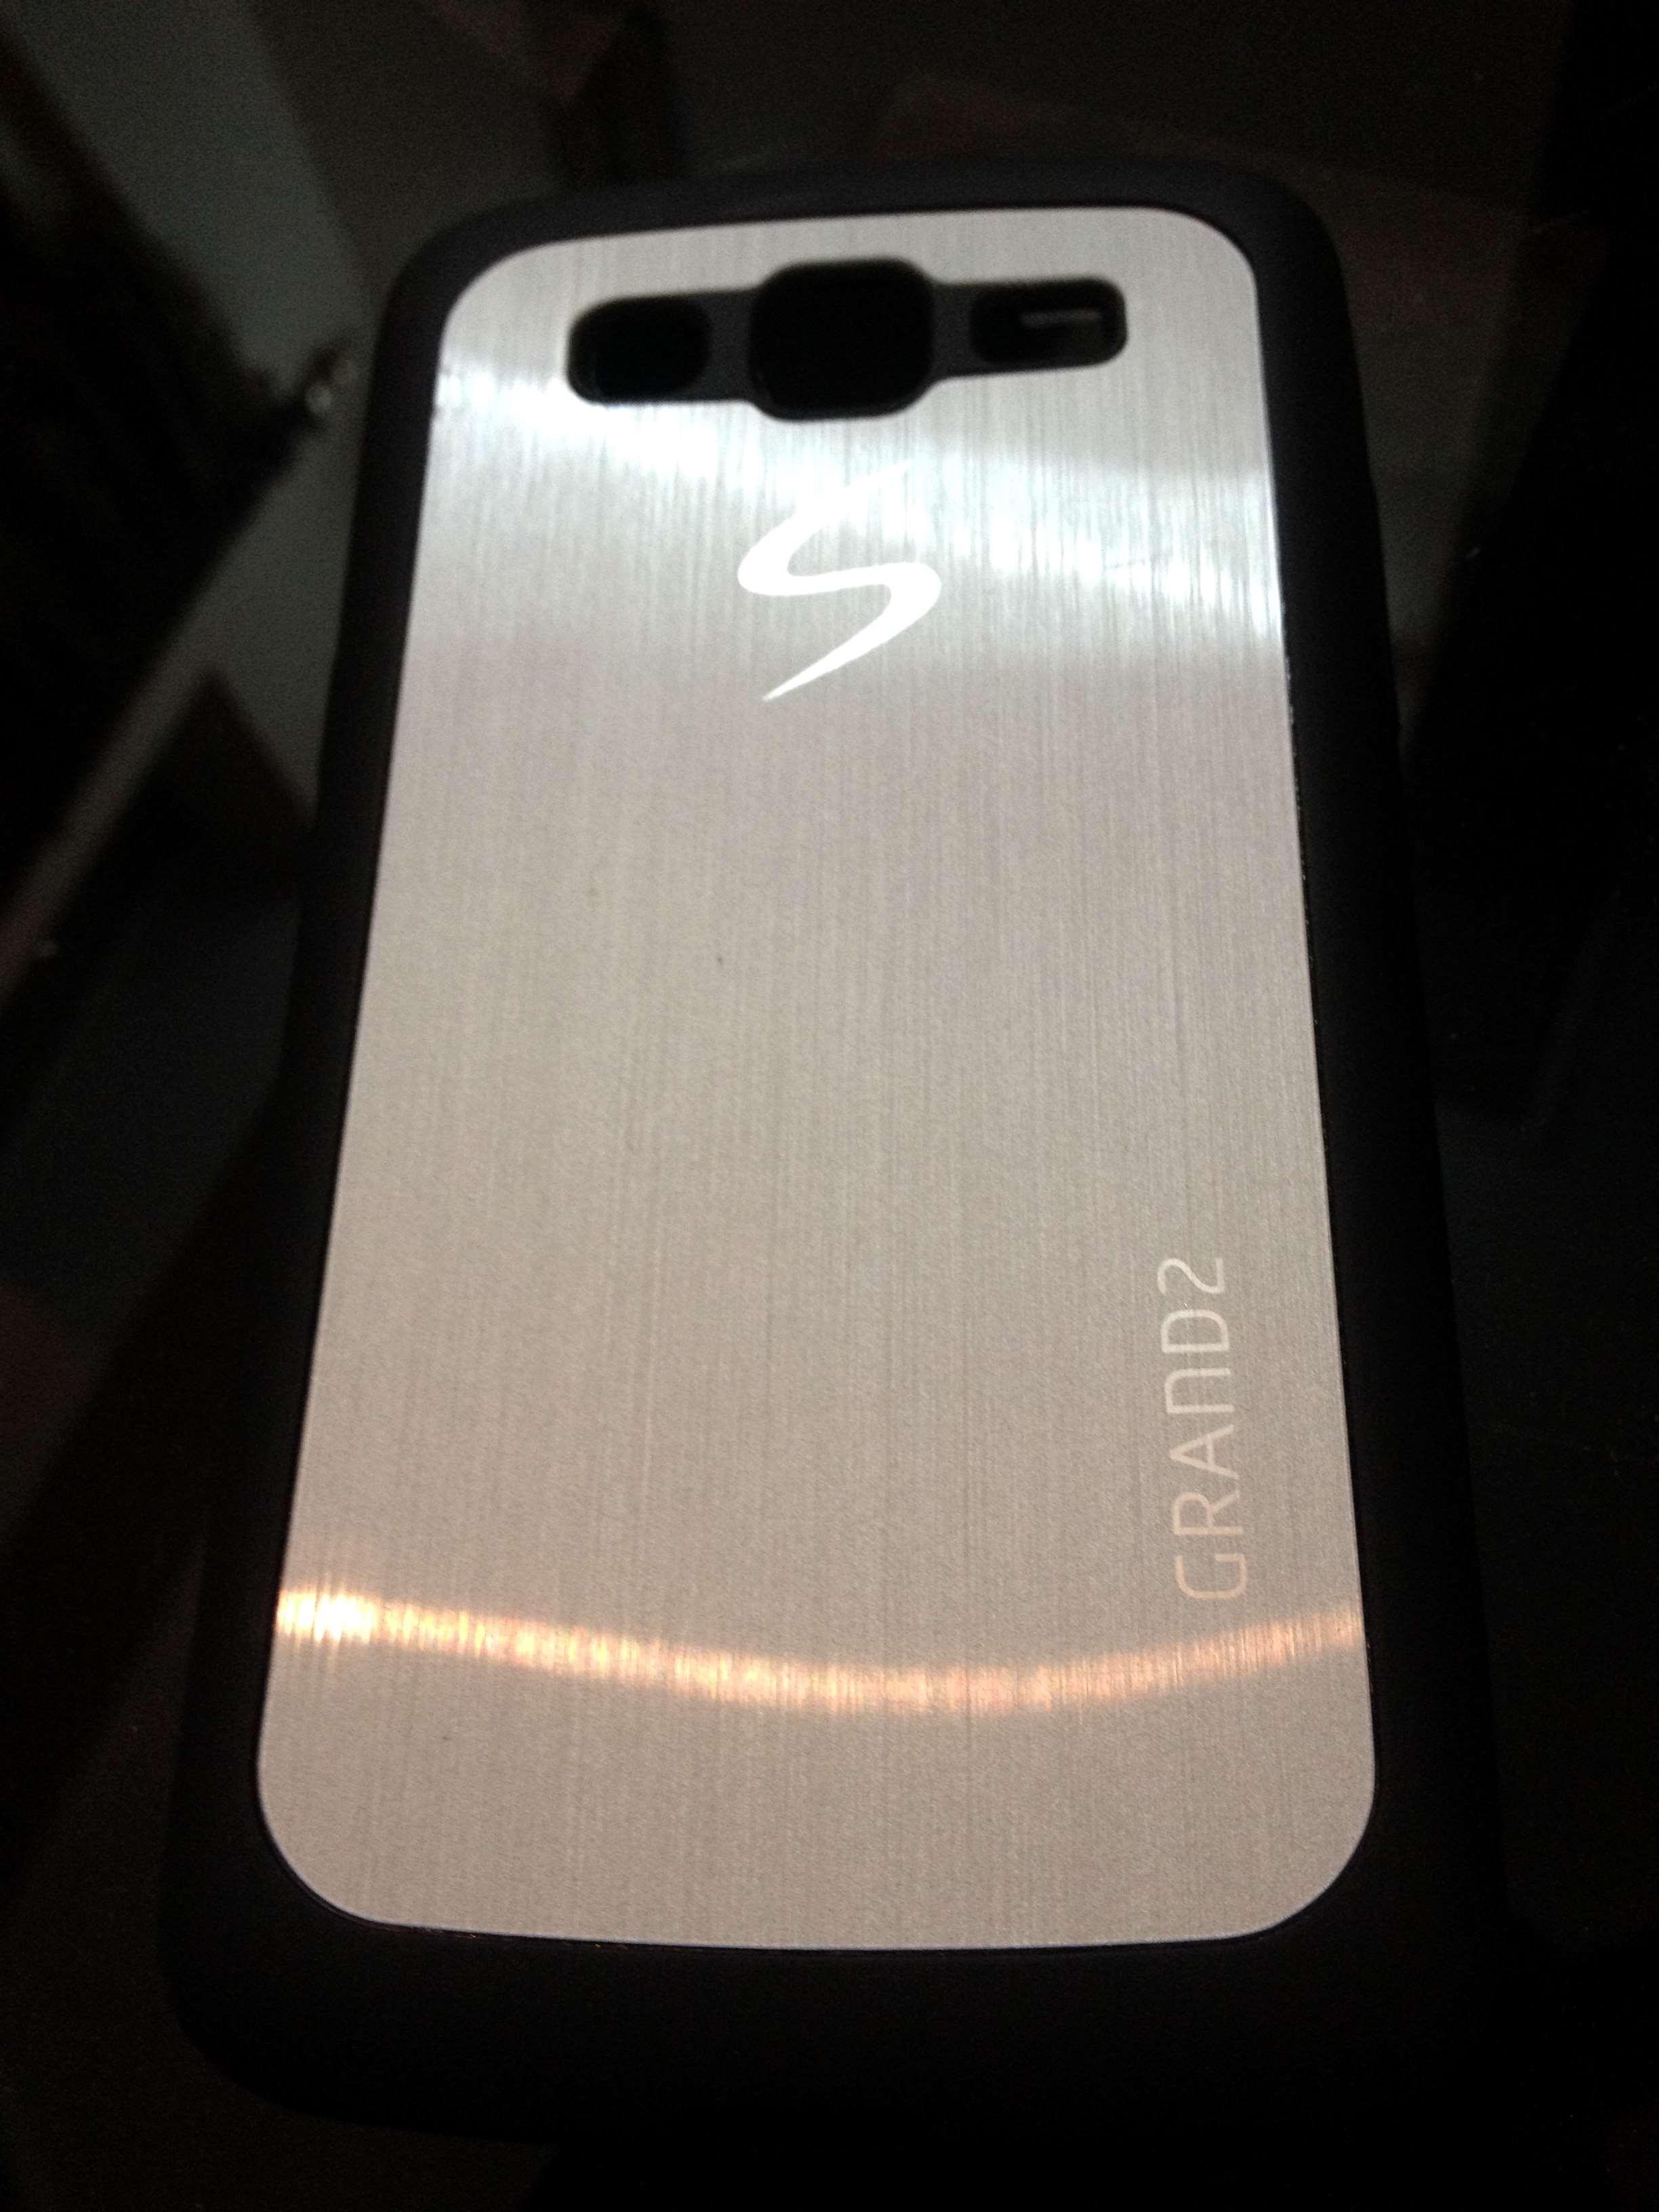 Samsung Galaxy Grand 2 Cover Stylish Designer Metal Shine Soft Back Tempered Glass Neo I9060 Case